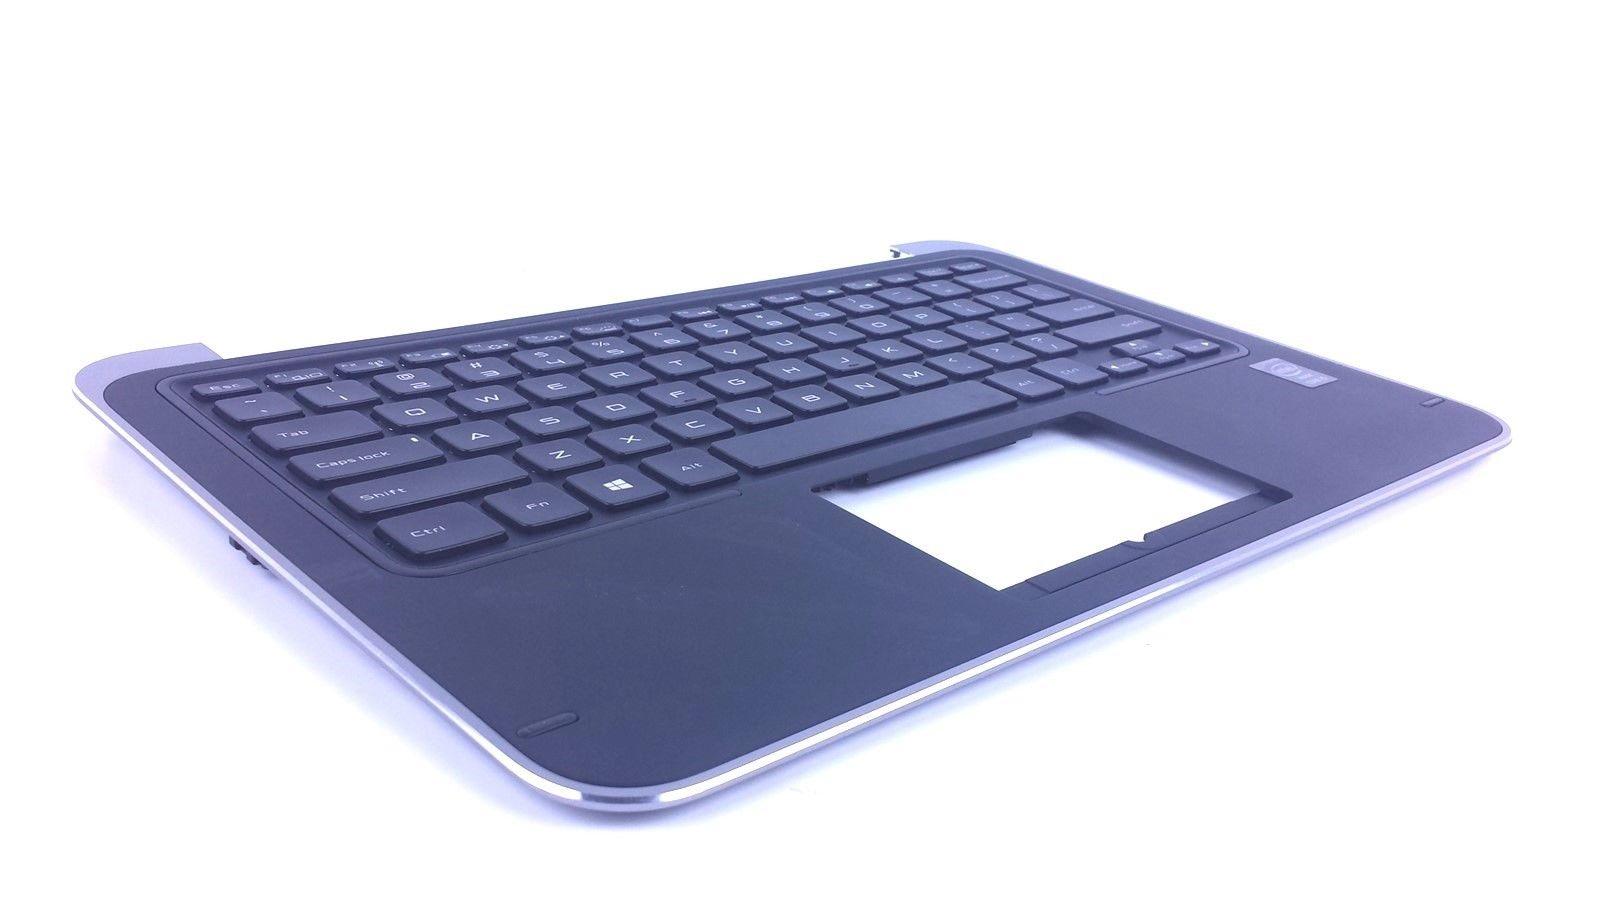 Genuine Dell XPS 12 9Q33 Genuine Laptop Palmrest Keyboard P6DWF 20P5F 9WCC8